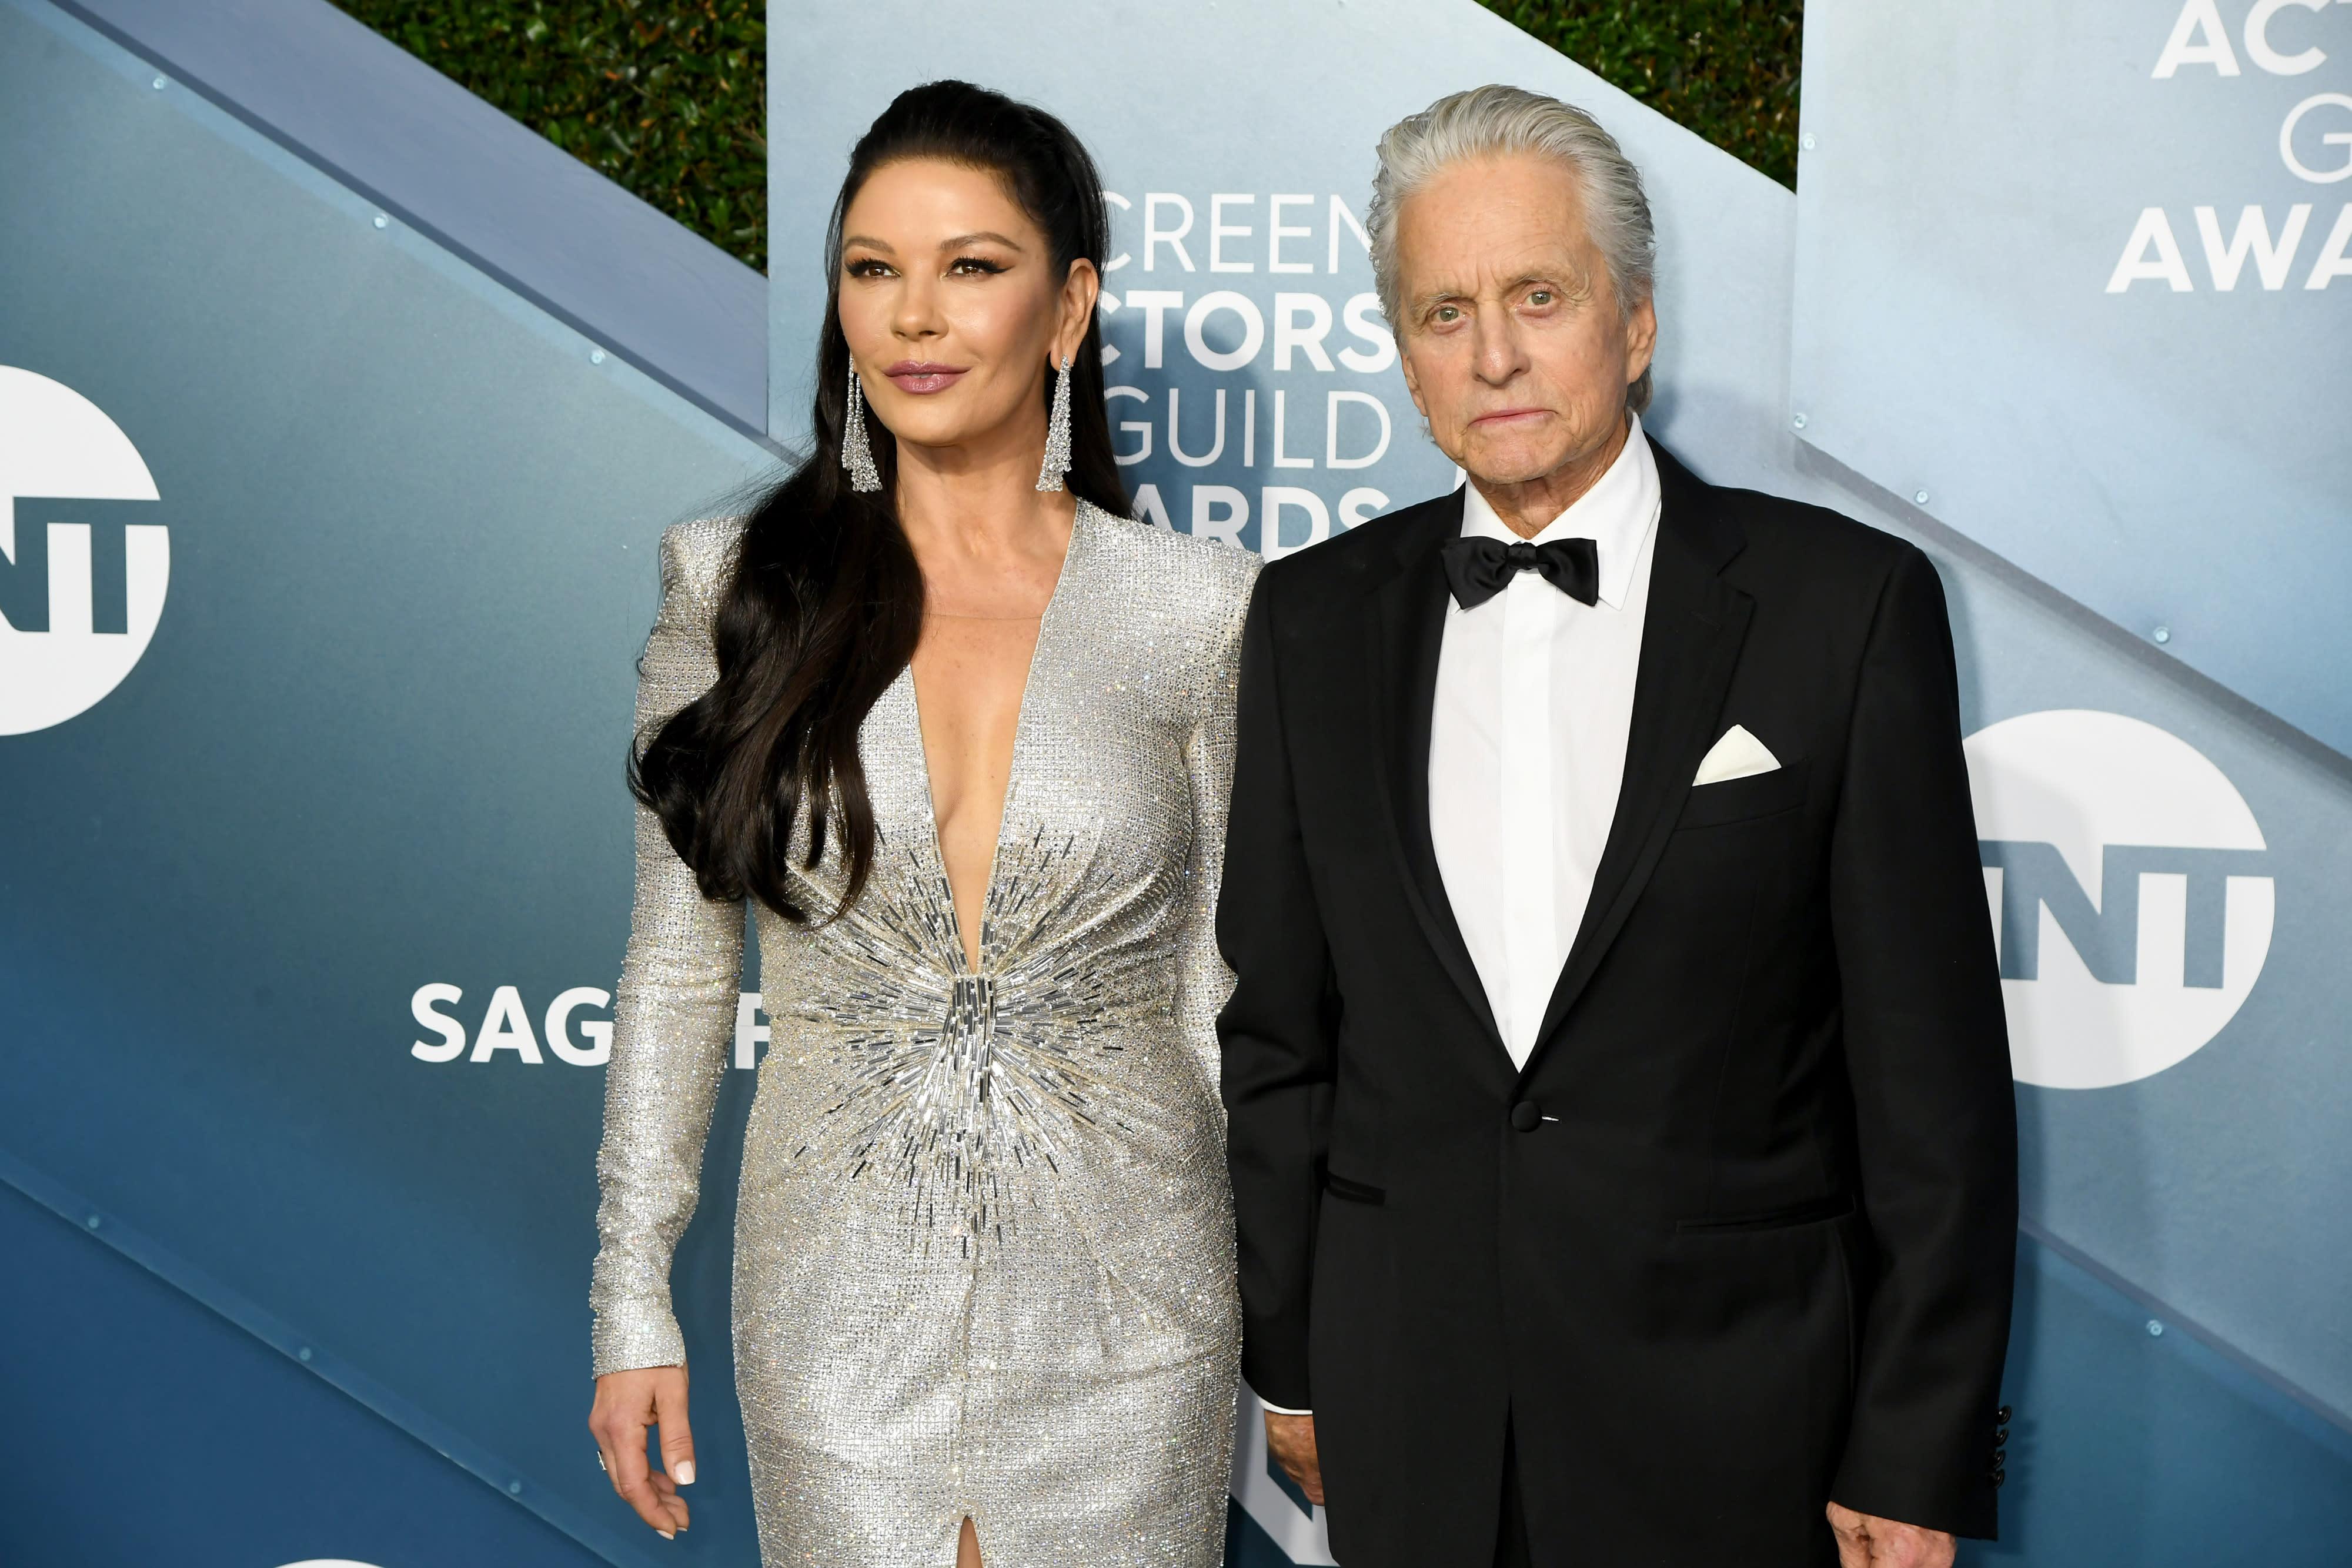 Catherine Zeta-Jones opens up on 20th wedding anniversary plans with Michael Douglas